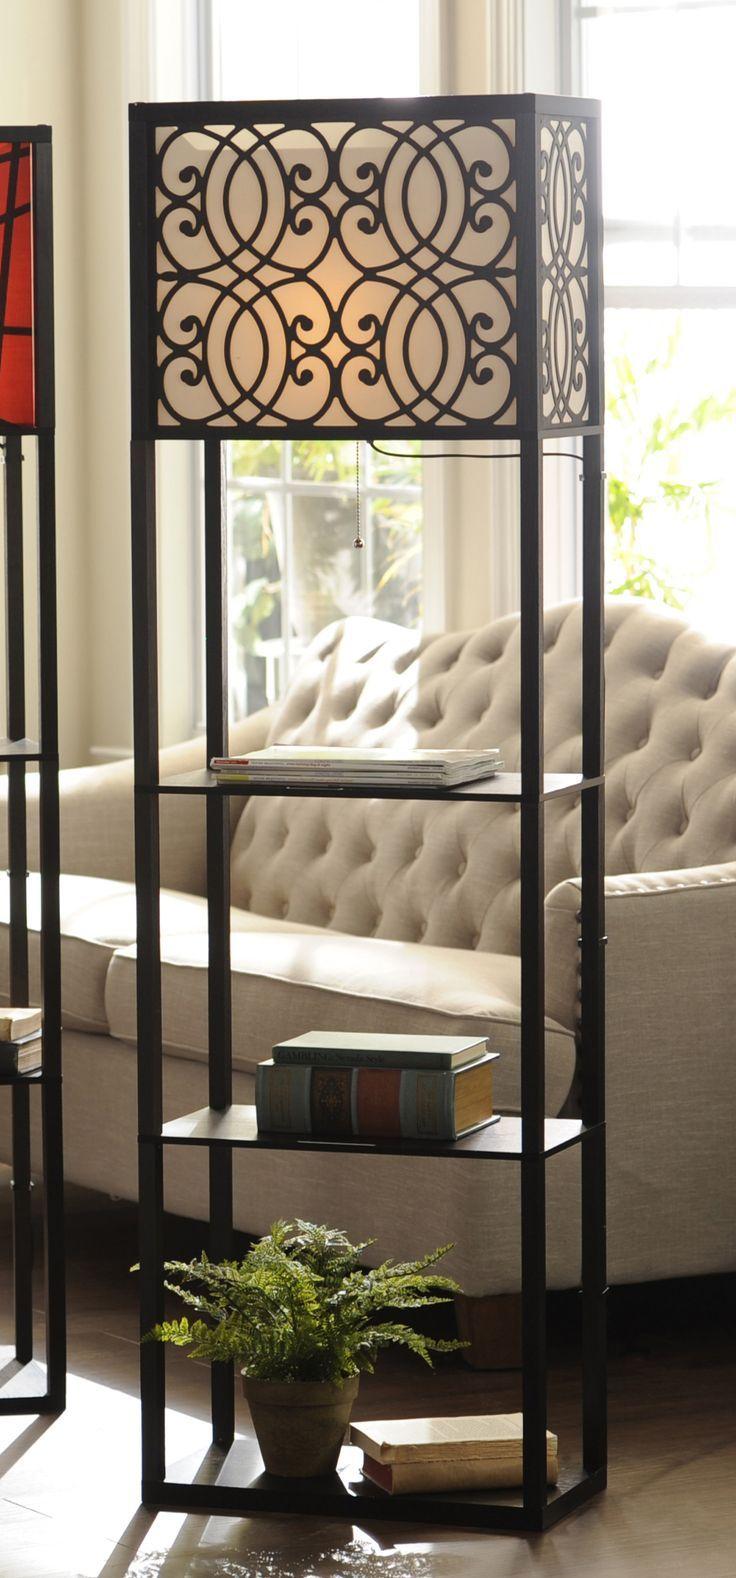 Grady Wide Shelf Floor Lamp   http centophobe com grady Best 25  Bright floor lamp ideas on Pinterest   Living room floor  . Floor Lamps Living Room. Home Design Ideas